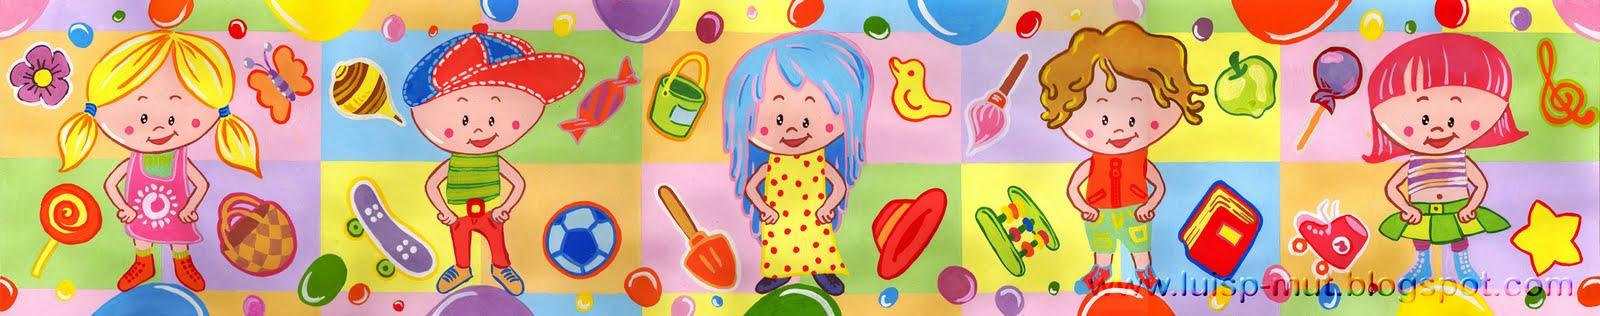 Cenefas para infantiles imprimibles y moldes gratis - Cenefas decorativas para imprimir ...